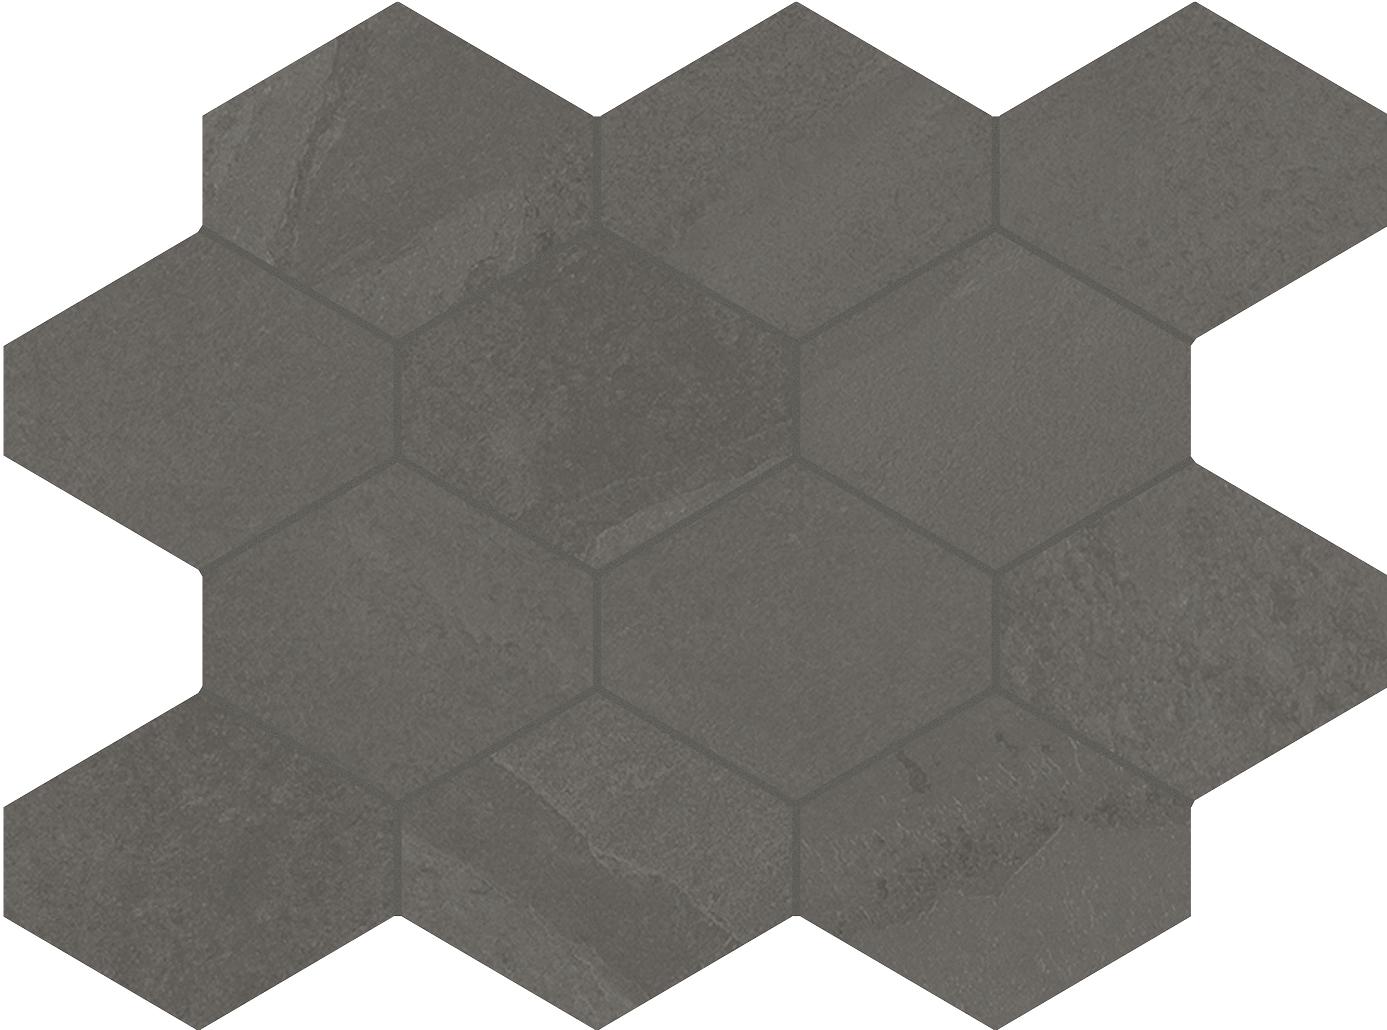 Unicom Starker BRAZILIAN SLATE Elephant Grey Hexagon UNI-0008493 Mosaik 25x34 Matt